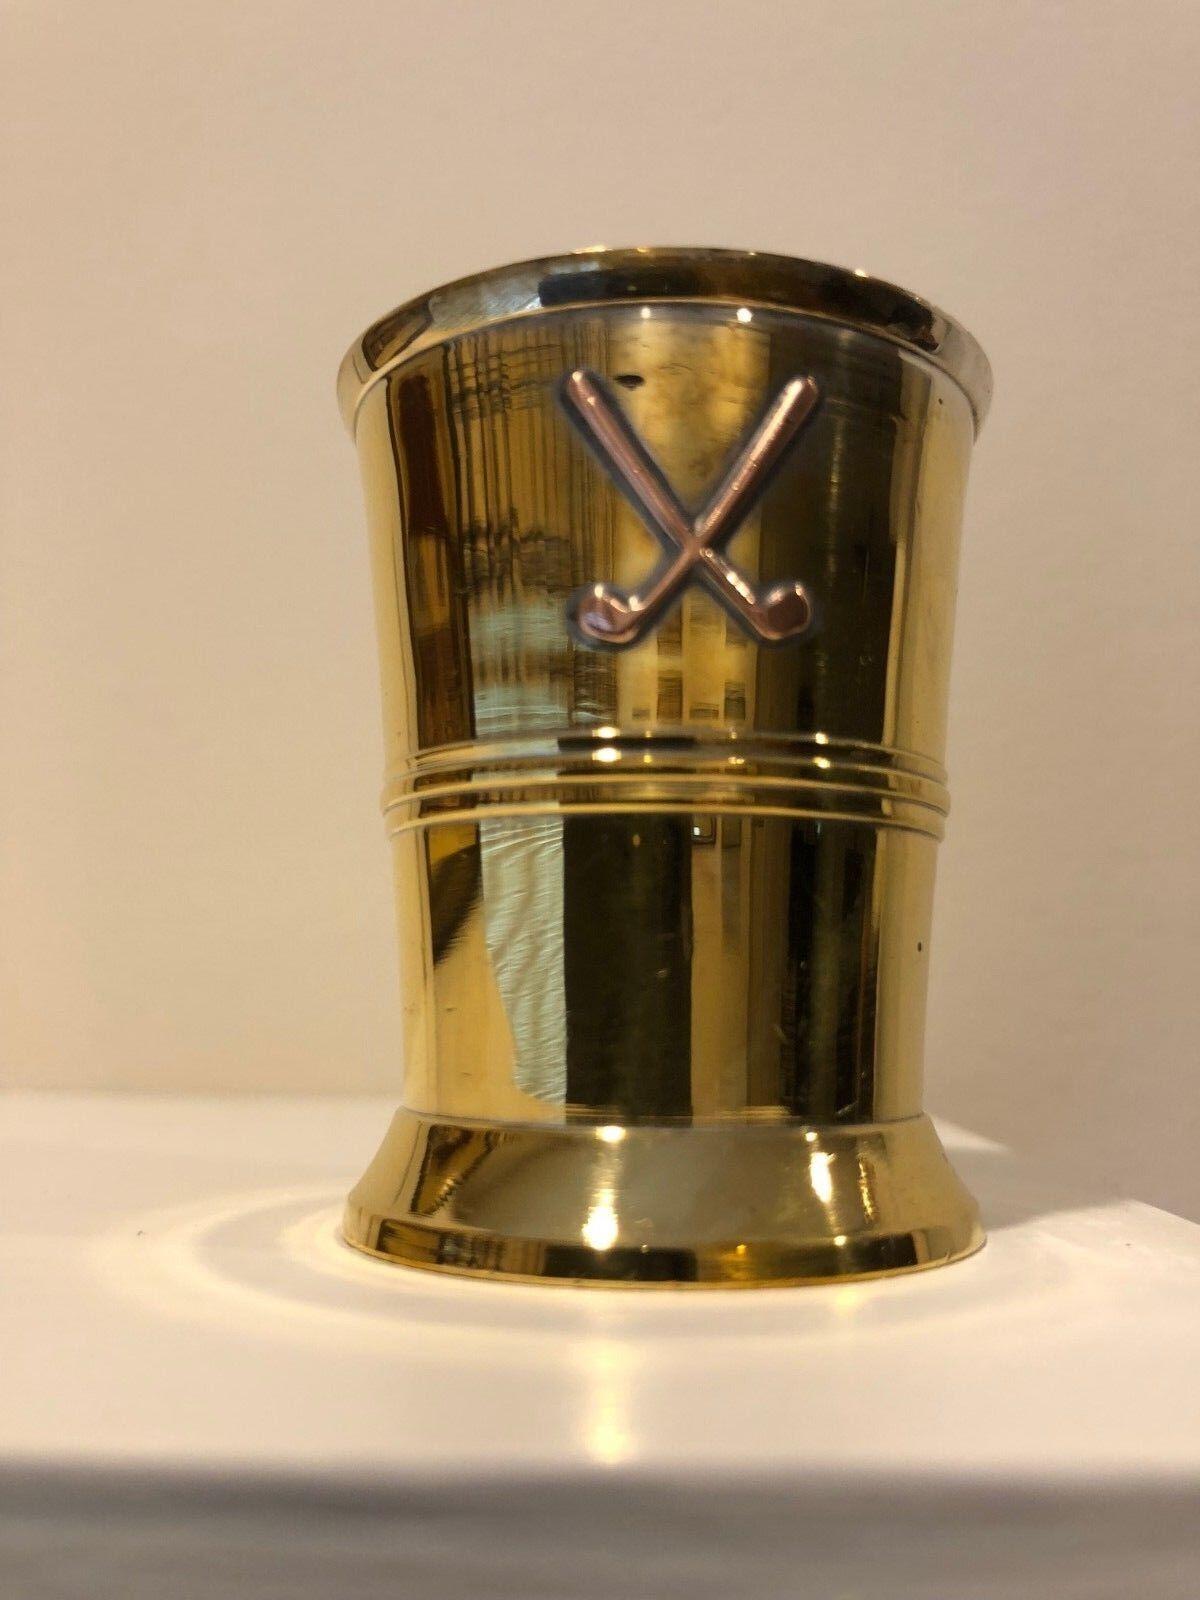 Brass Shot Glass Rosewood Box/Inlaid Brass Golf Clubs NEW/TAGS FREE S H W/BIN - $20.00